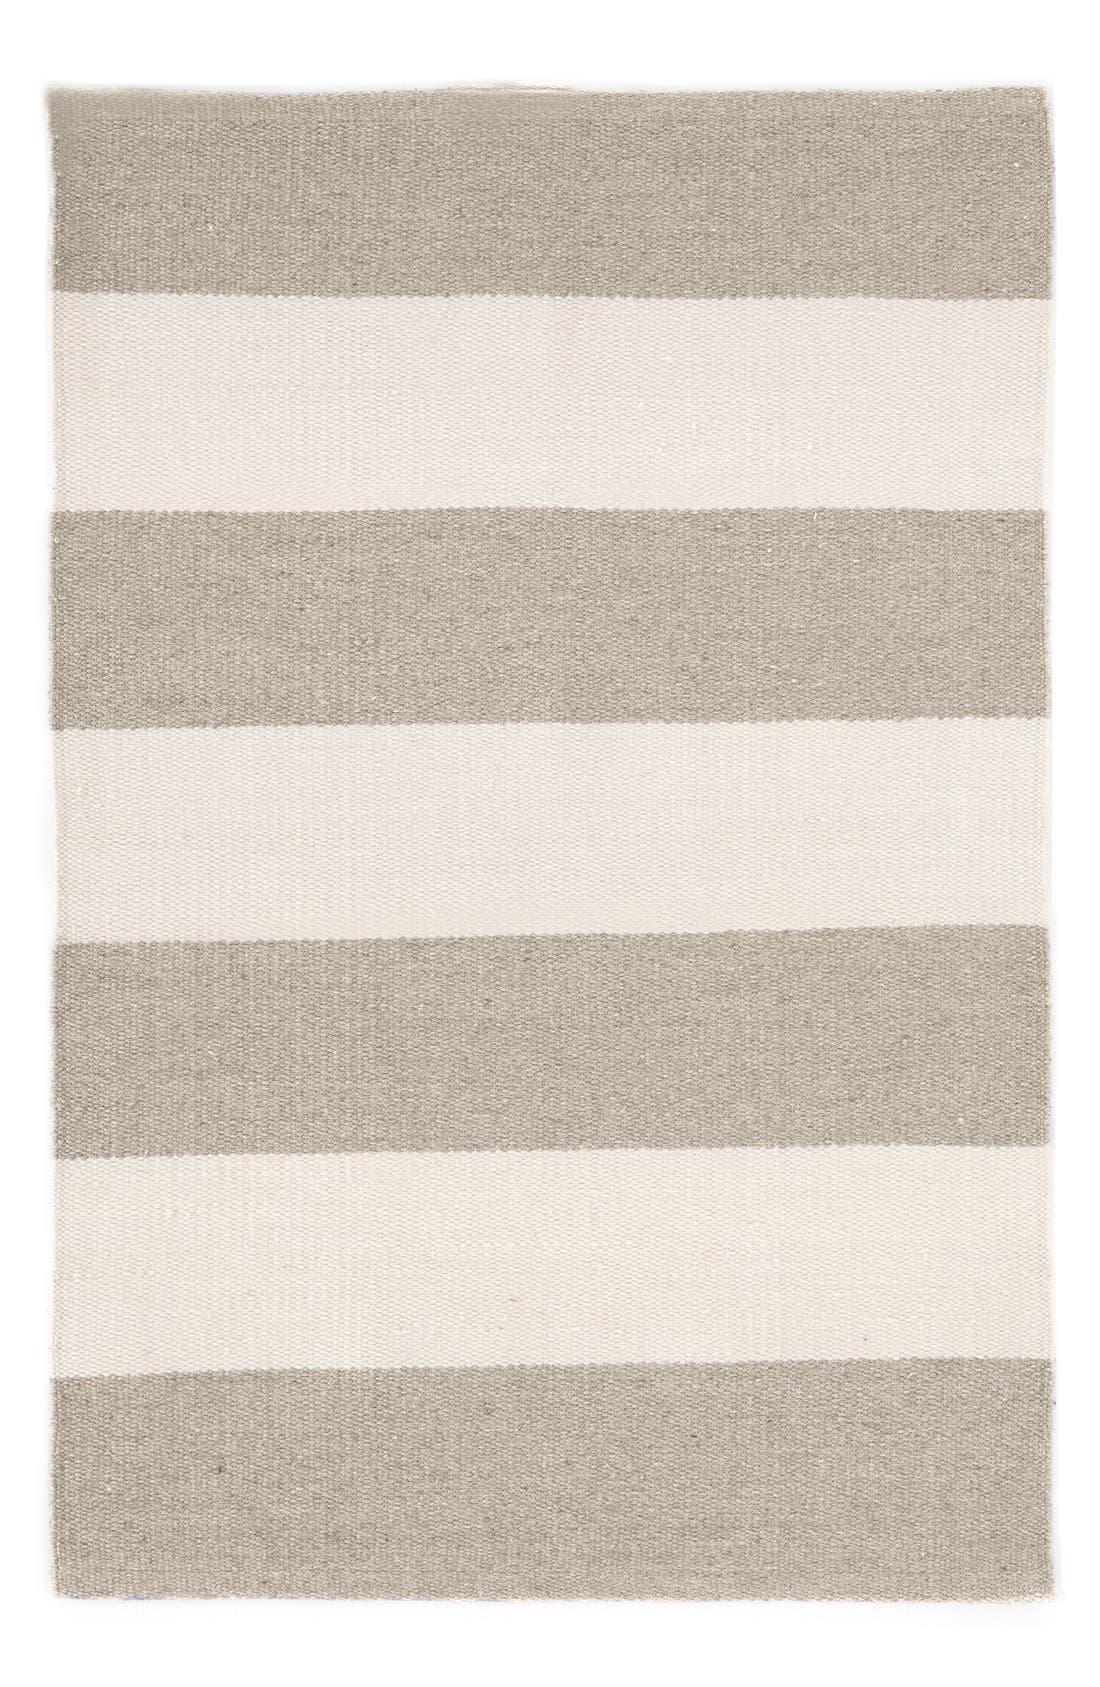 'Falls Village Stripe' Rug,                             Main thumbnail 1, color,                             CEMENT